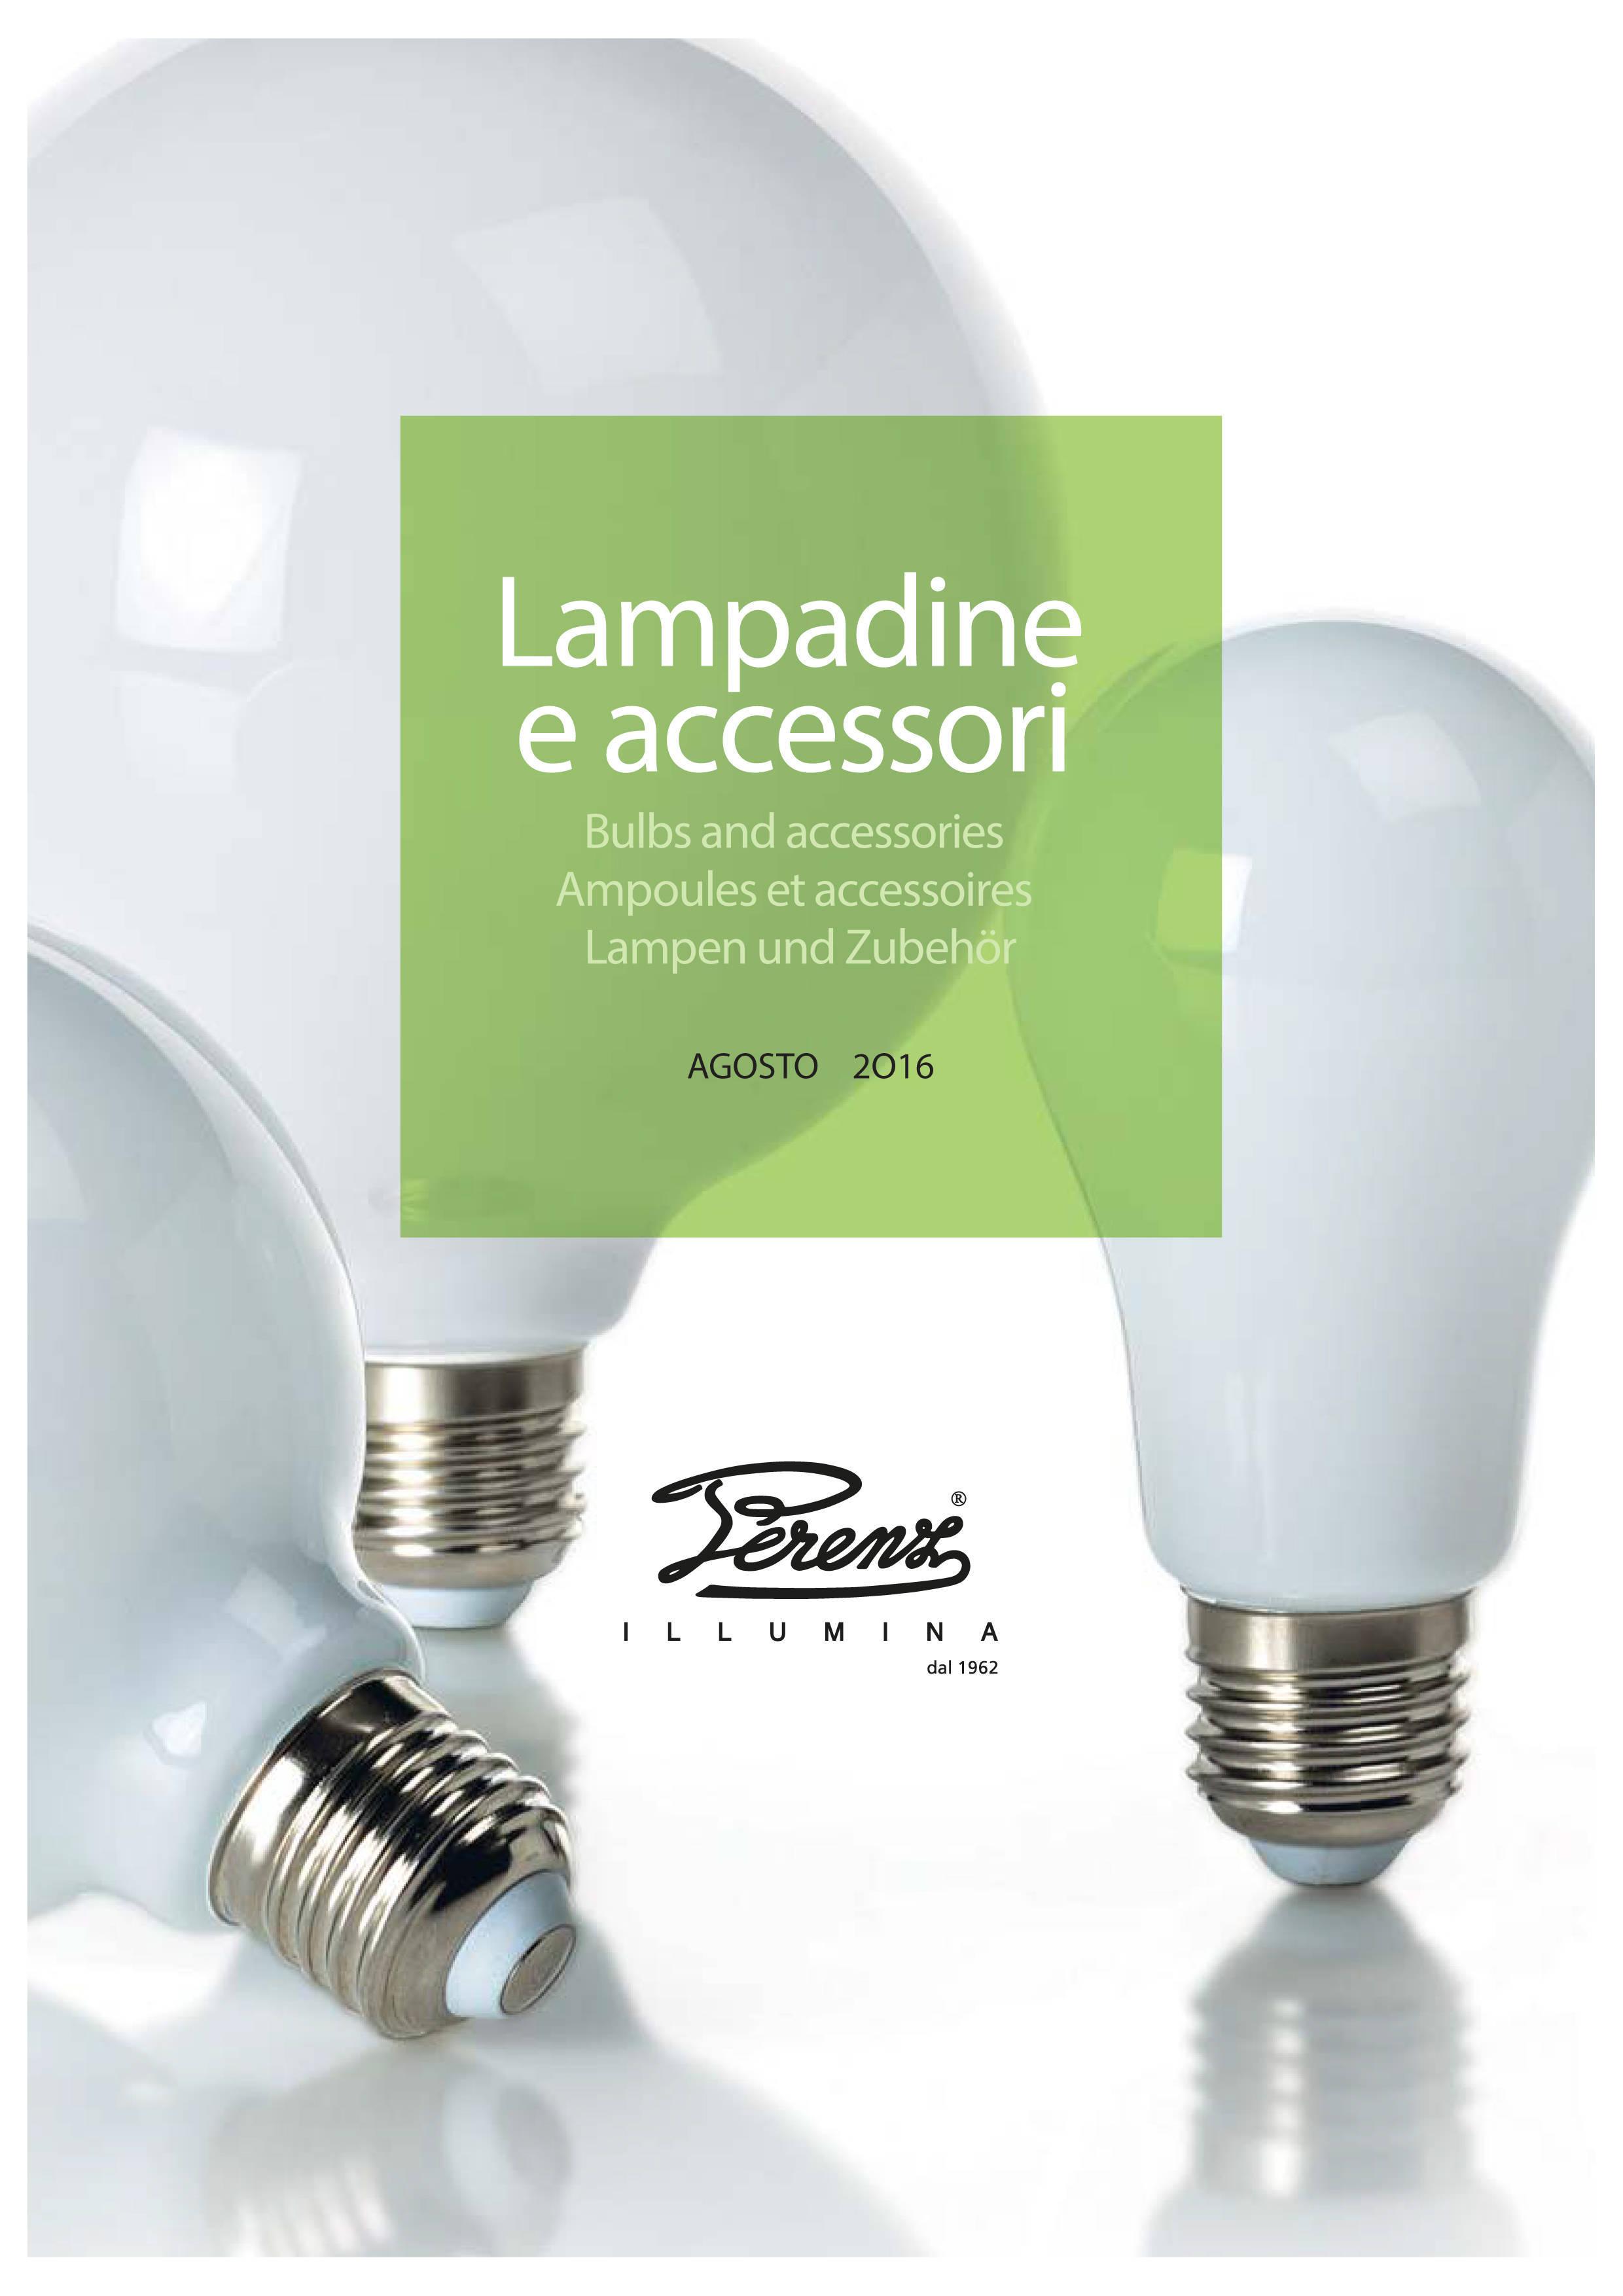 catalogo lampadine perenz